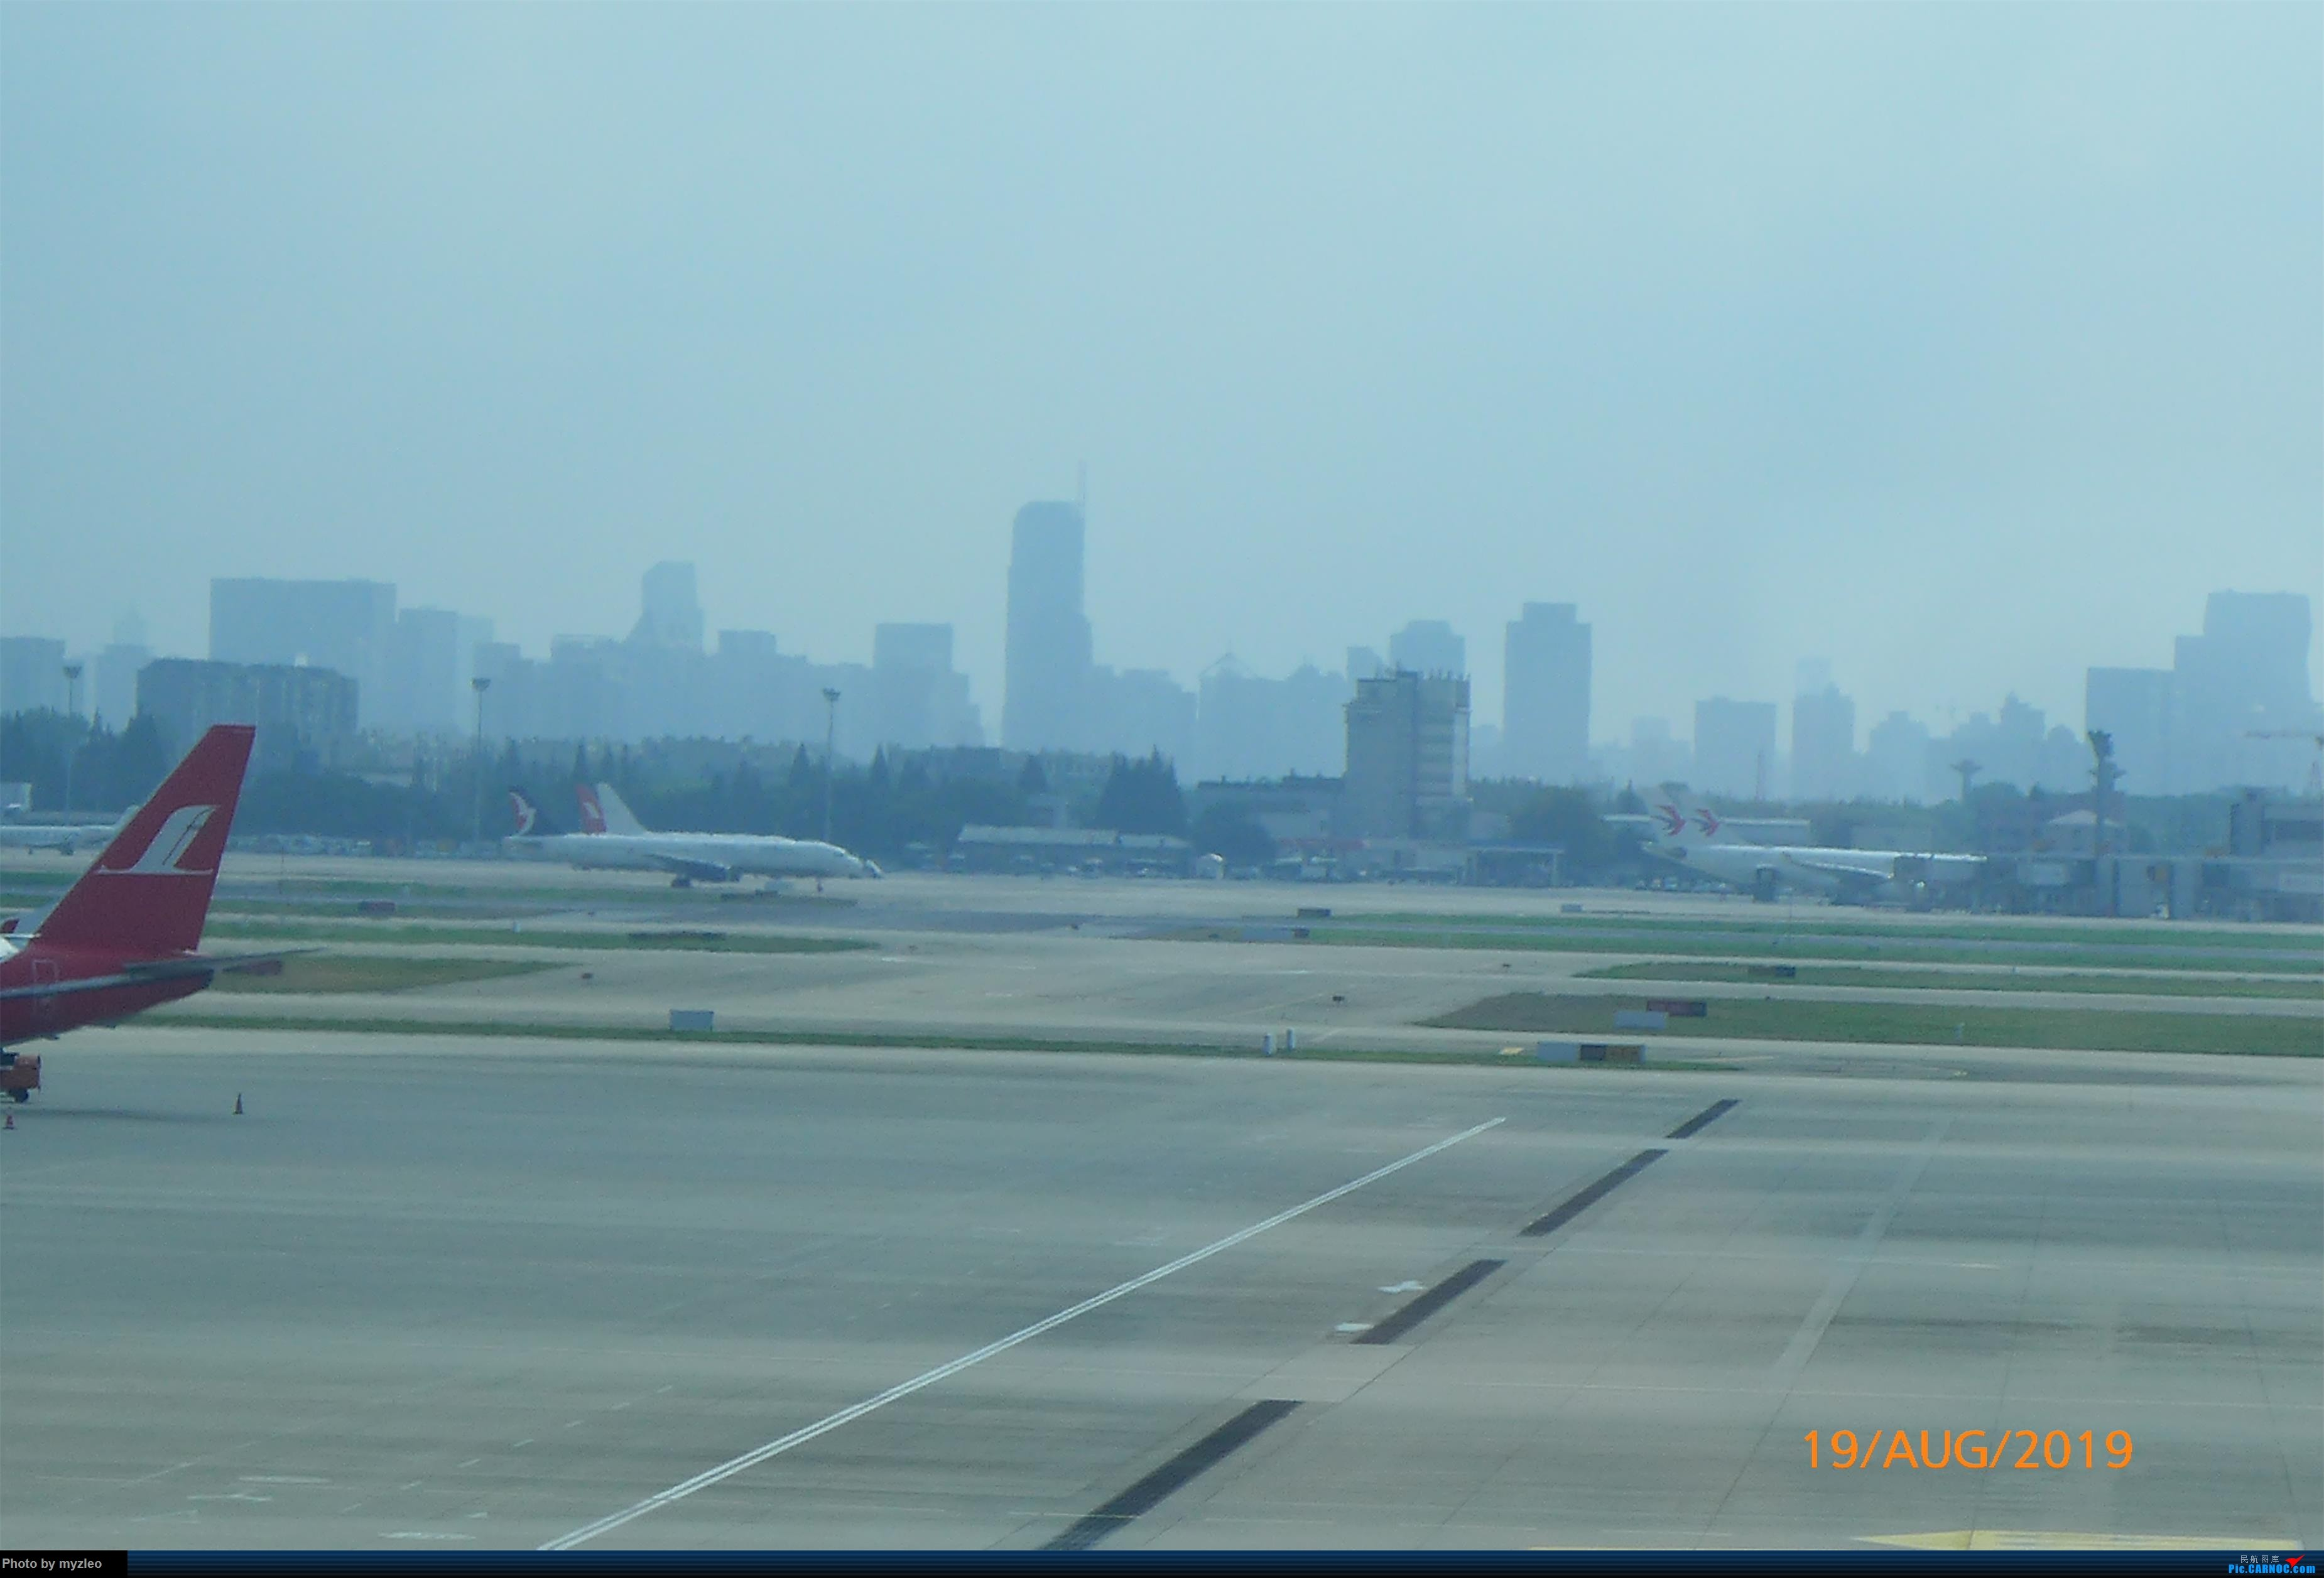 Re:[原创]【myzleo的游记5.1】梦圆一九(1)首搭国航359,北京城里到处走 BOEING 777-300ER B-2039 中国上海虹桥国际机场 中国上海虹桥国际机场